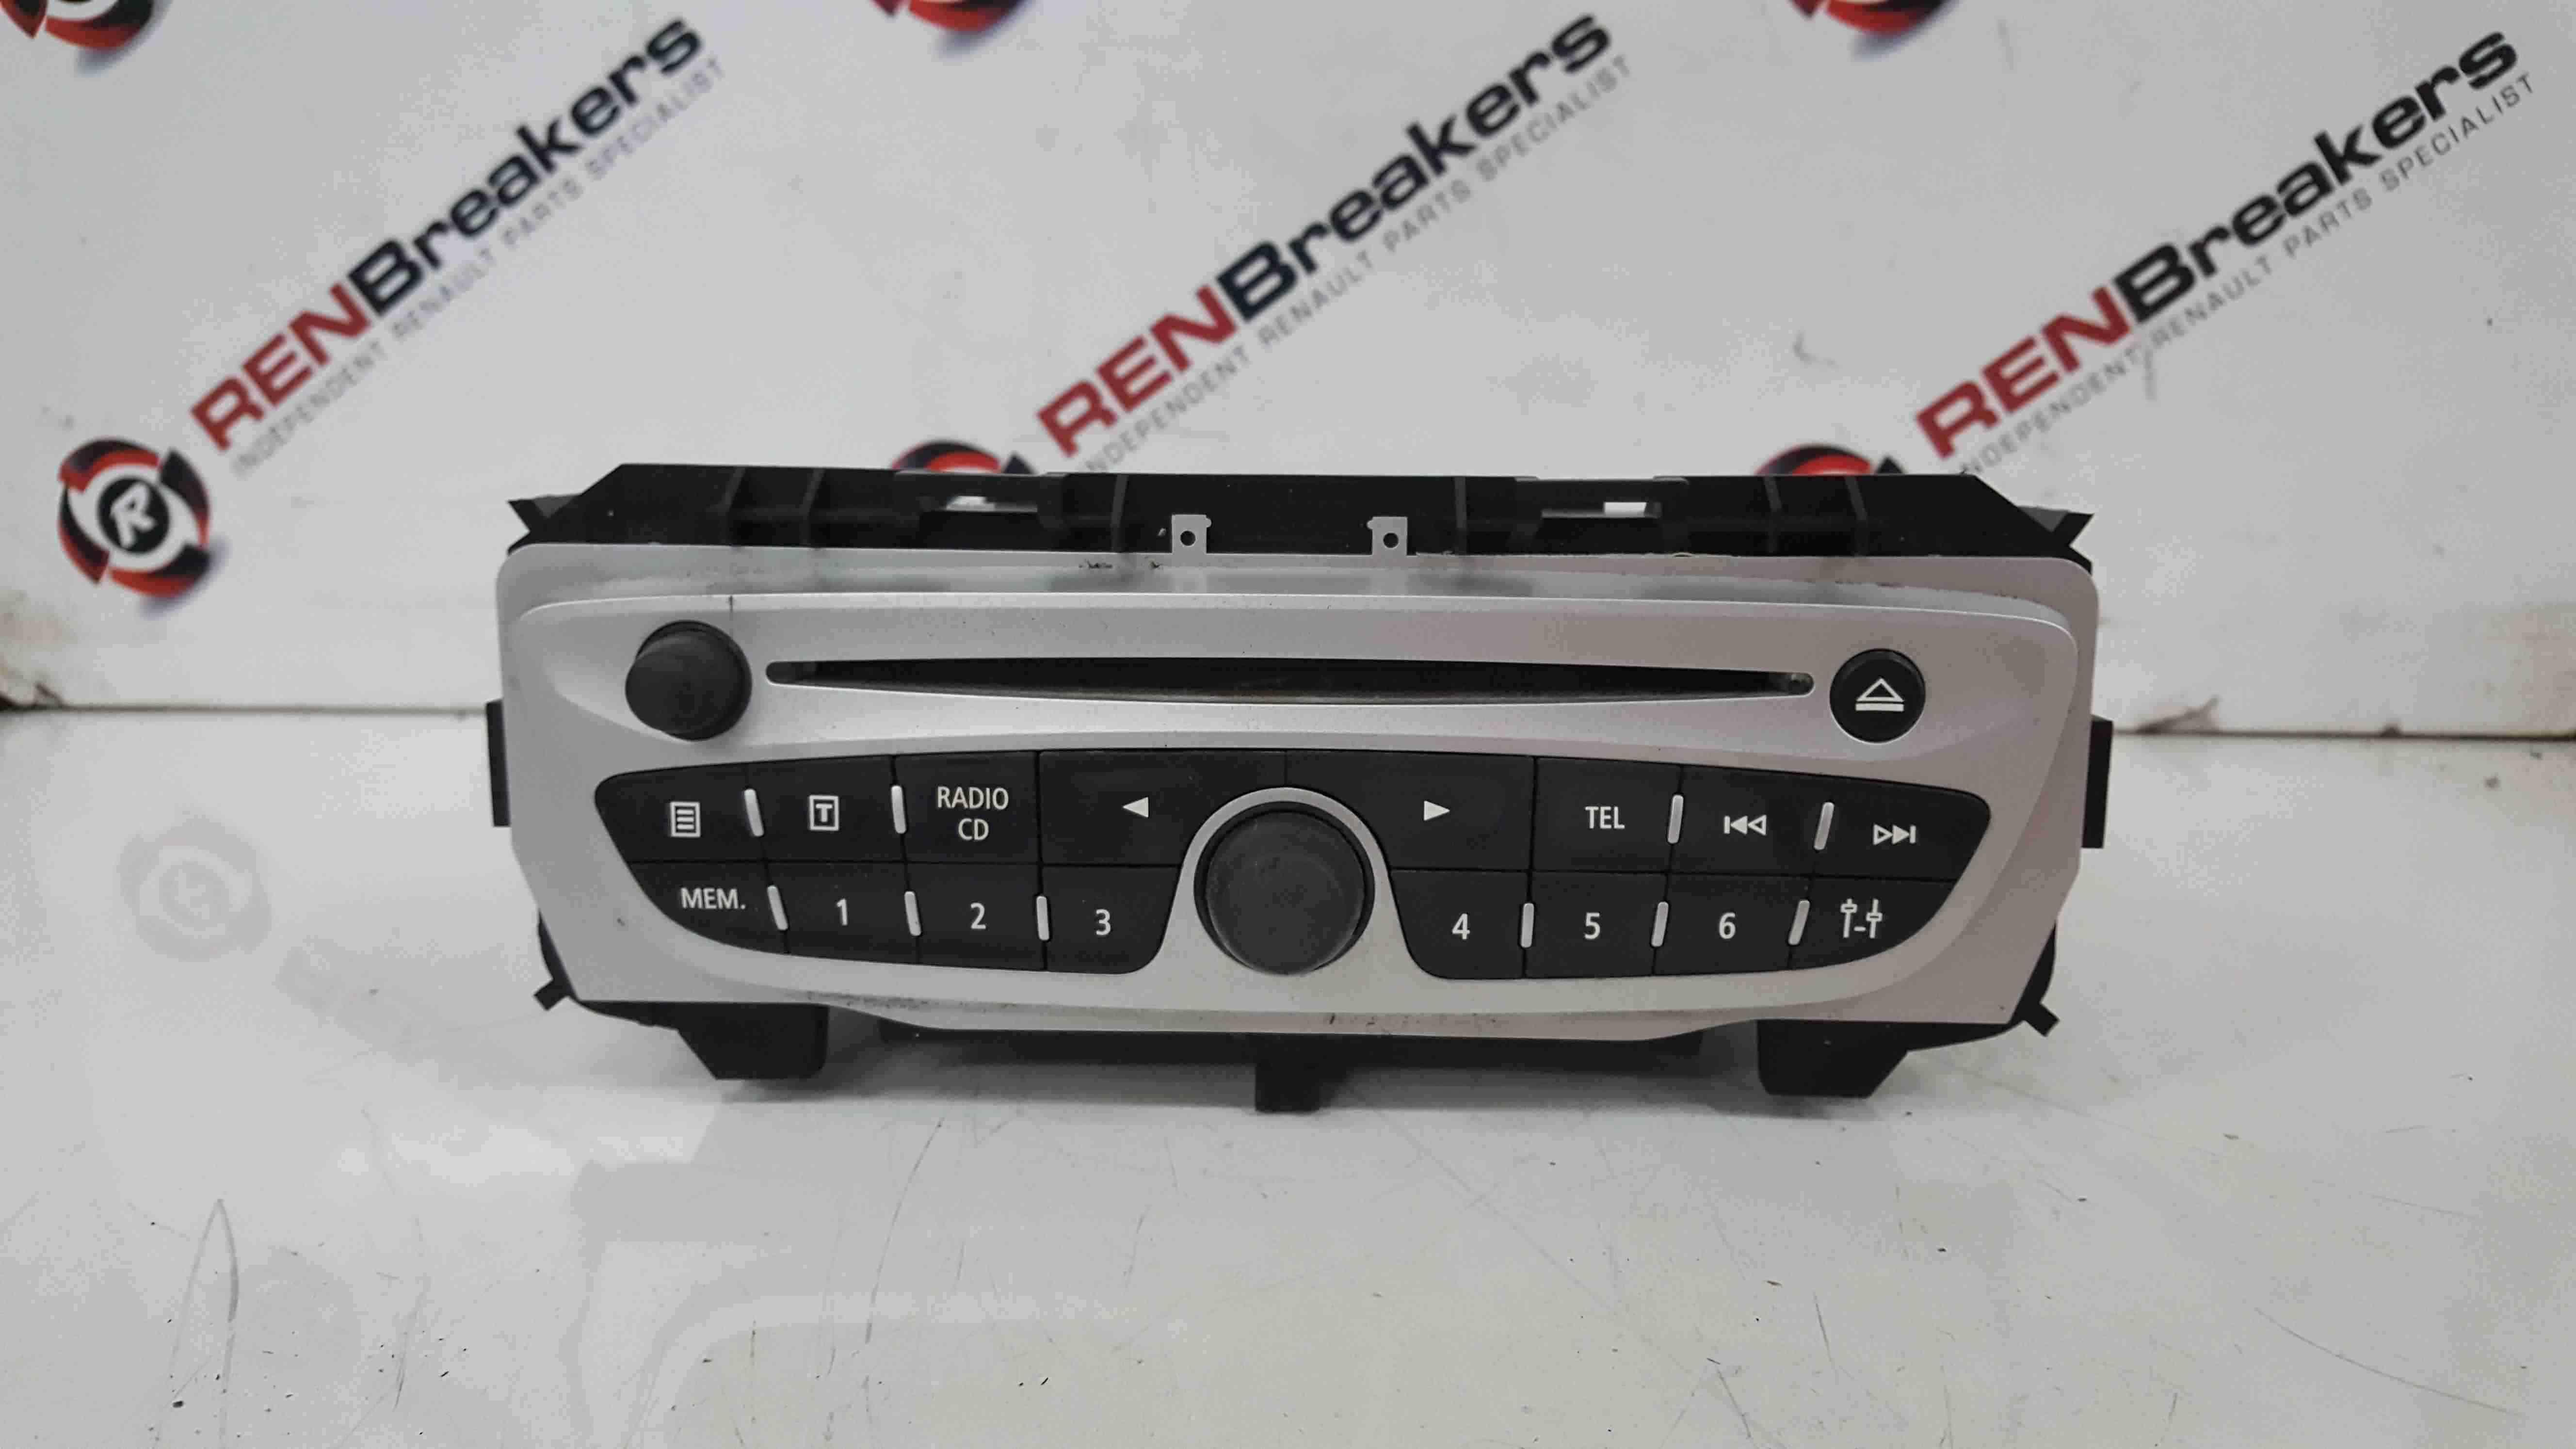 Renault Scenic MK3 2009-2016 Sat Nav Radio Cd Player 281151461R